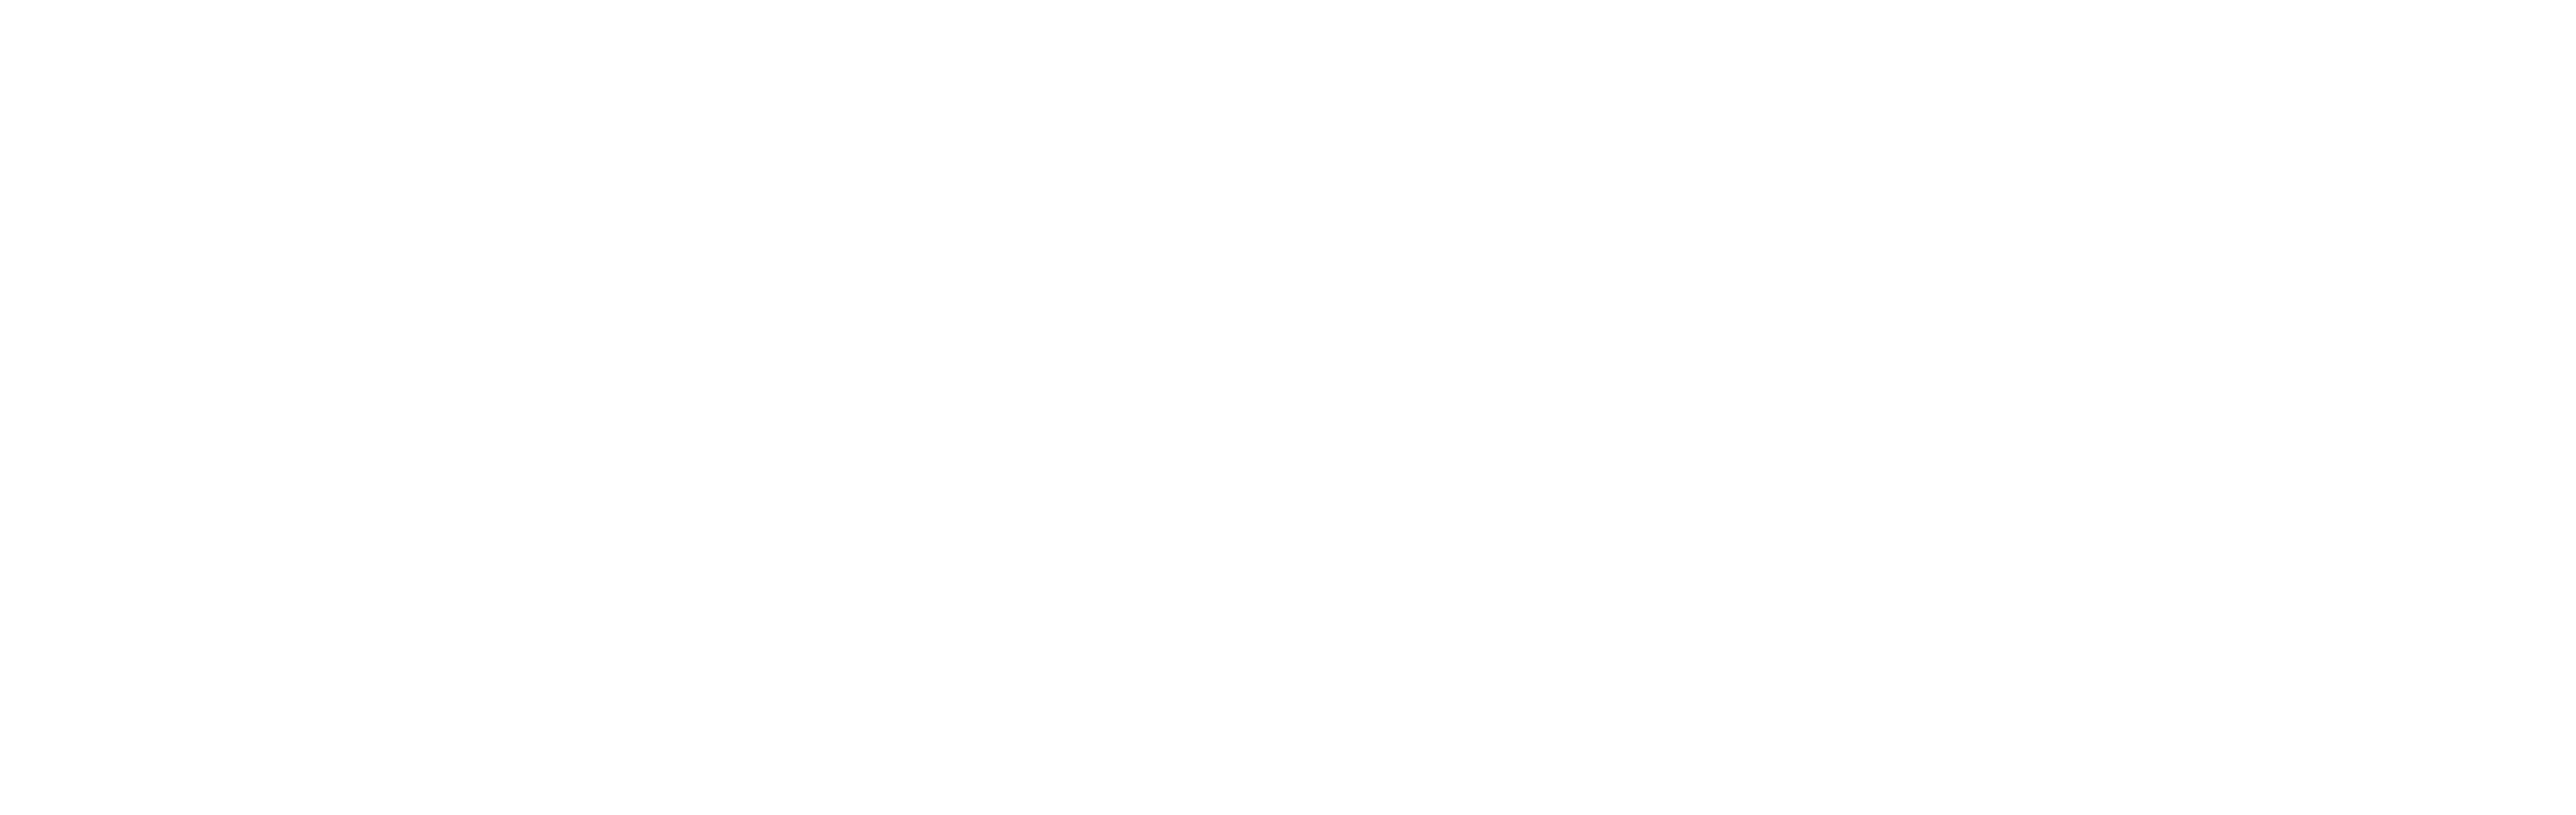 IBM_Security_lockup_rev_RGB